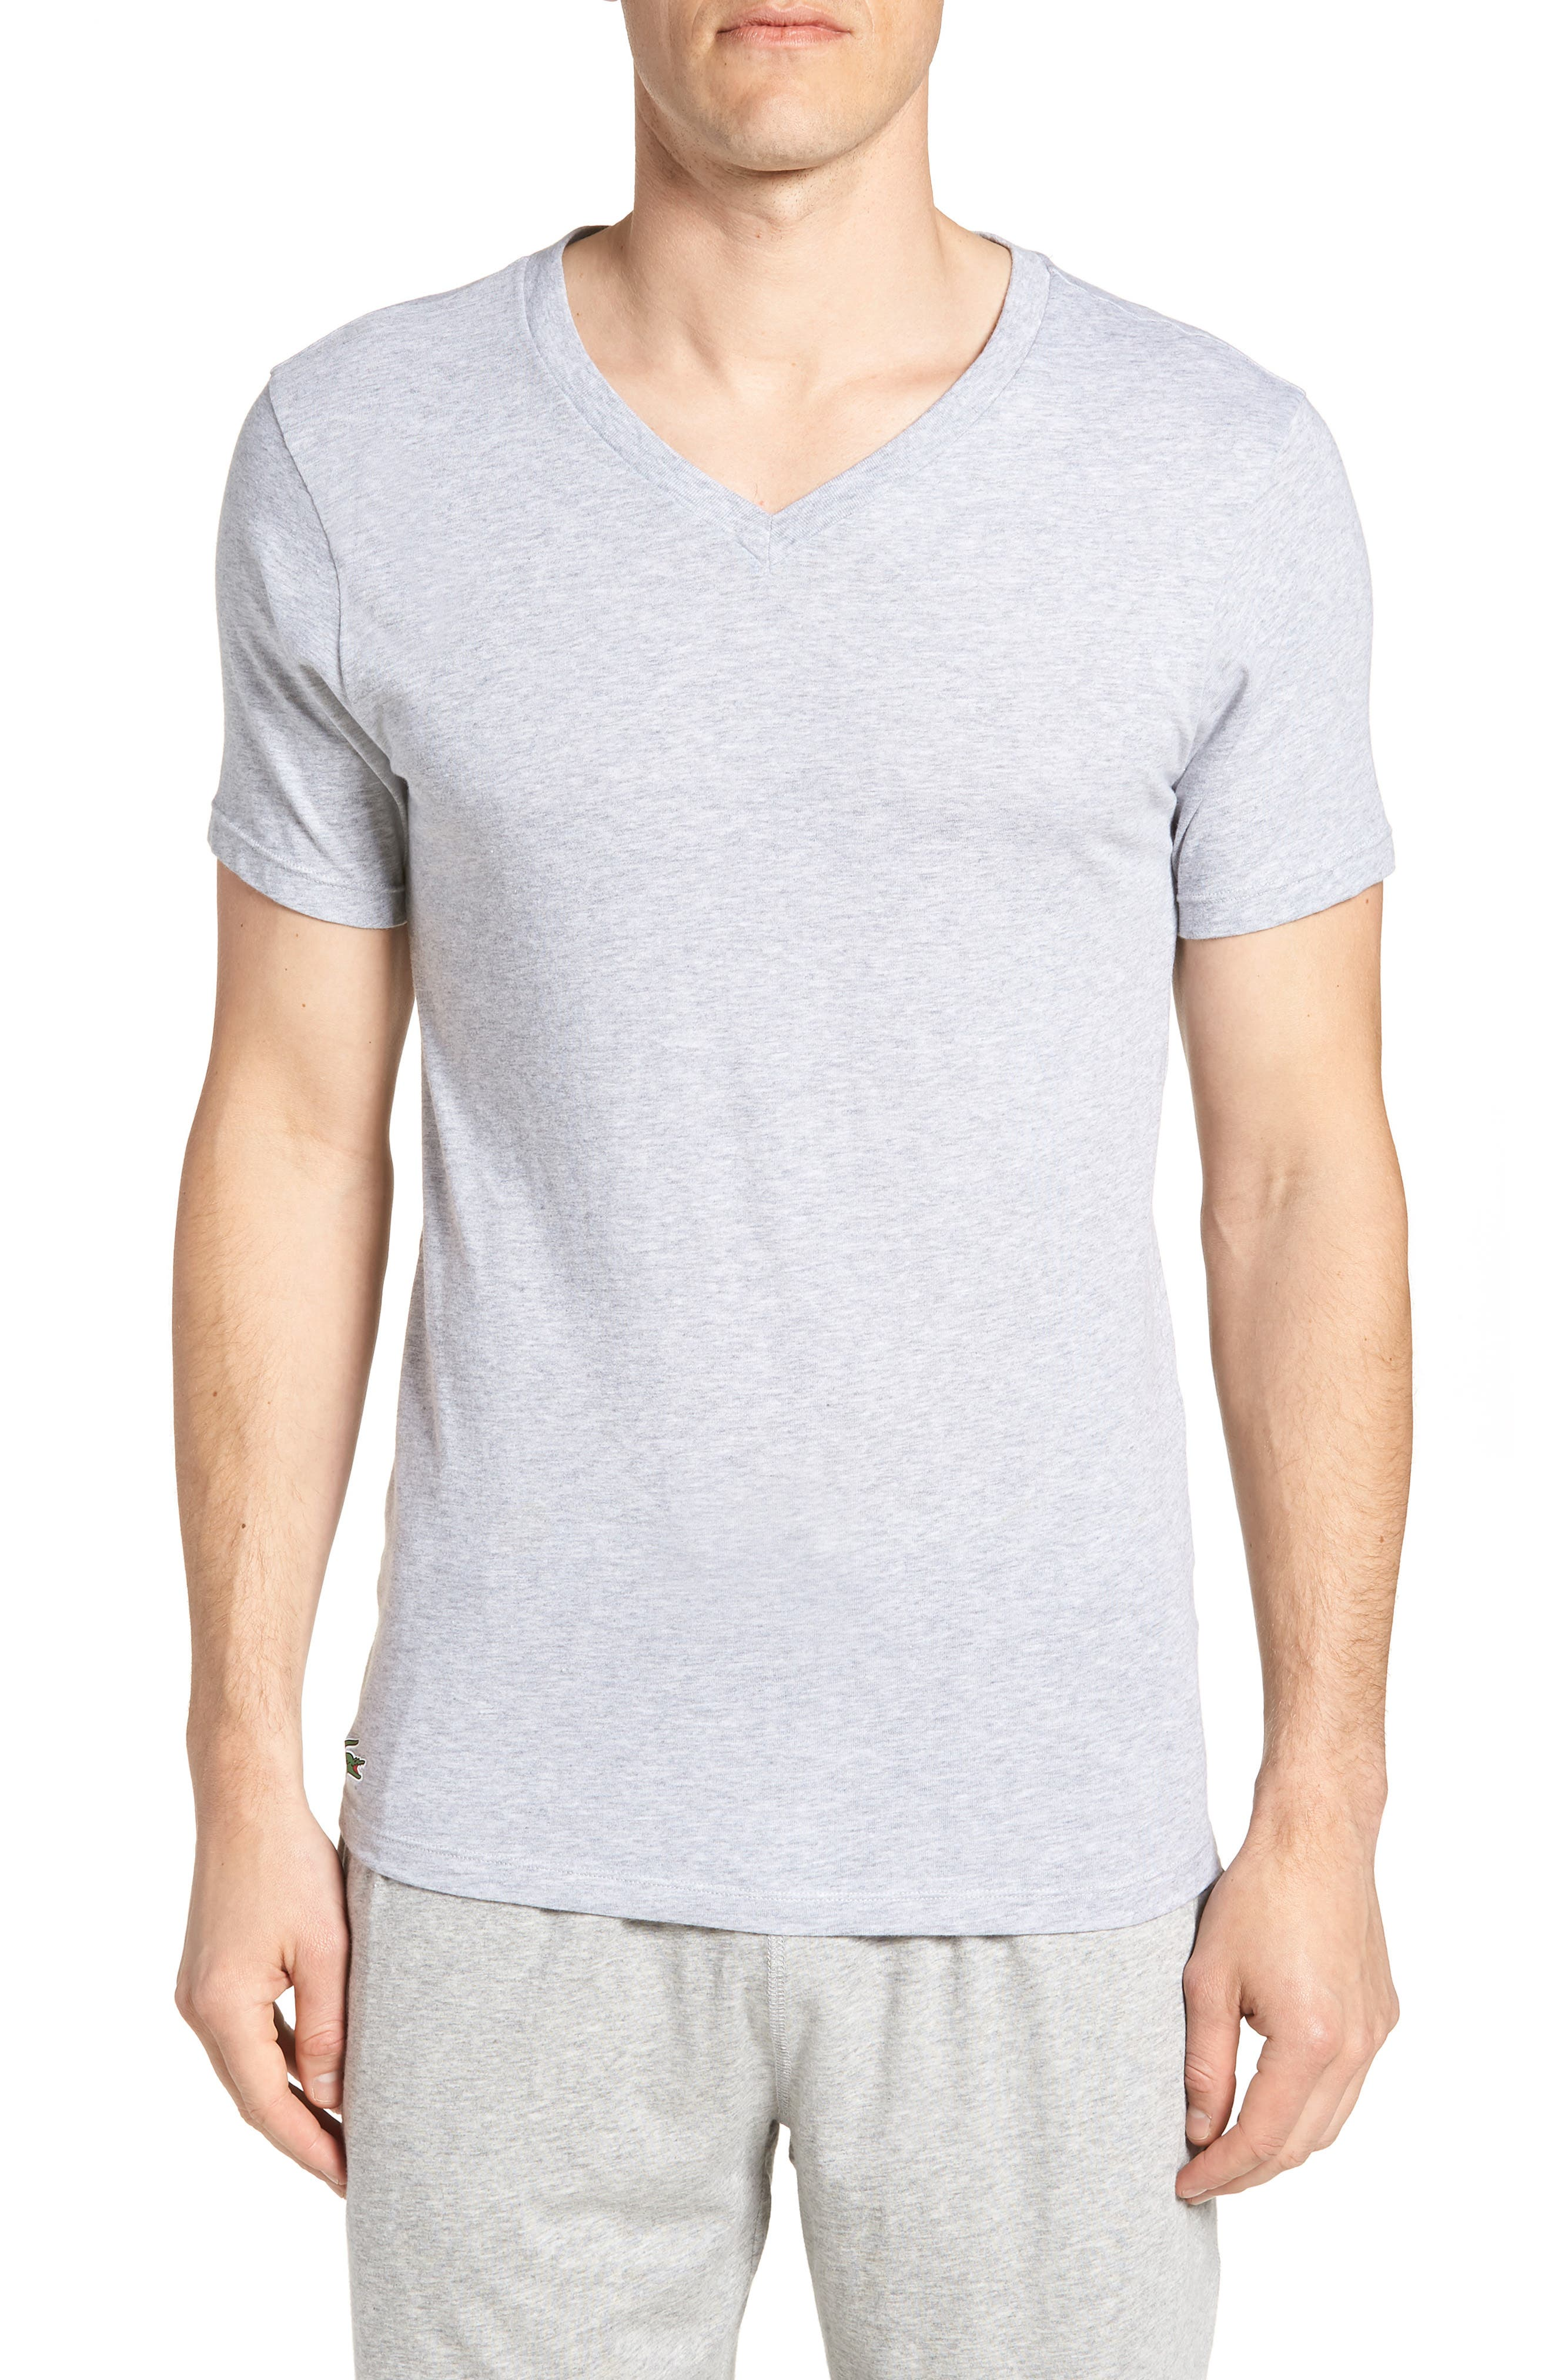 LACOSTE 3-Pack Slim Fit V-Neck T-Shirts, Main, color, BLACK/ GREY/ WHITE